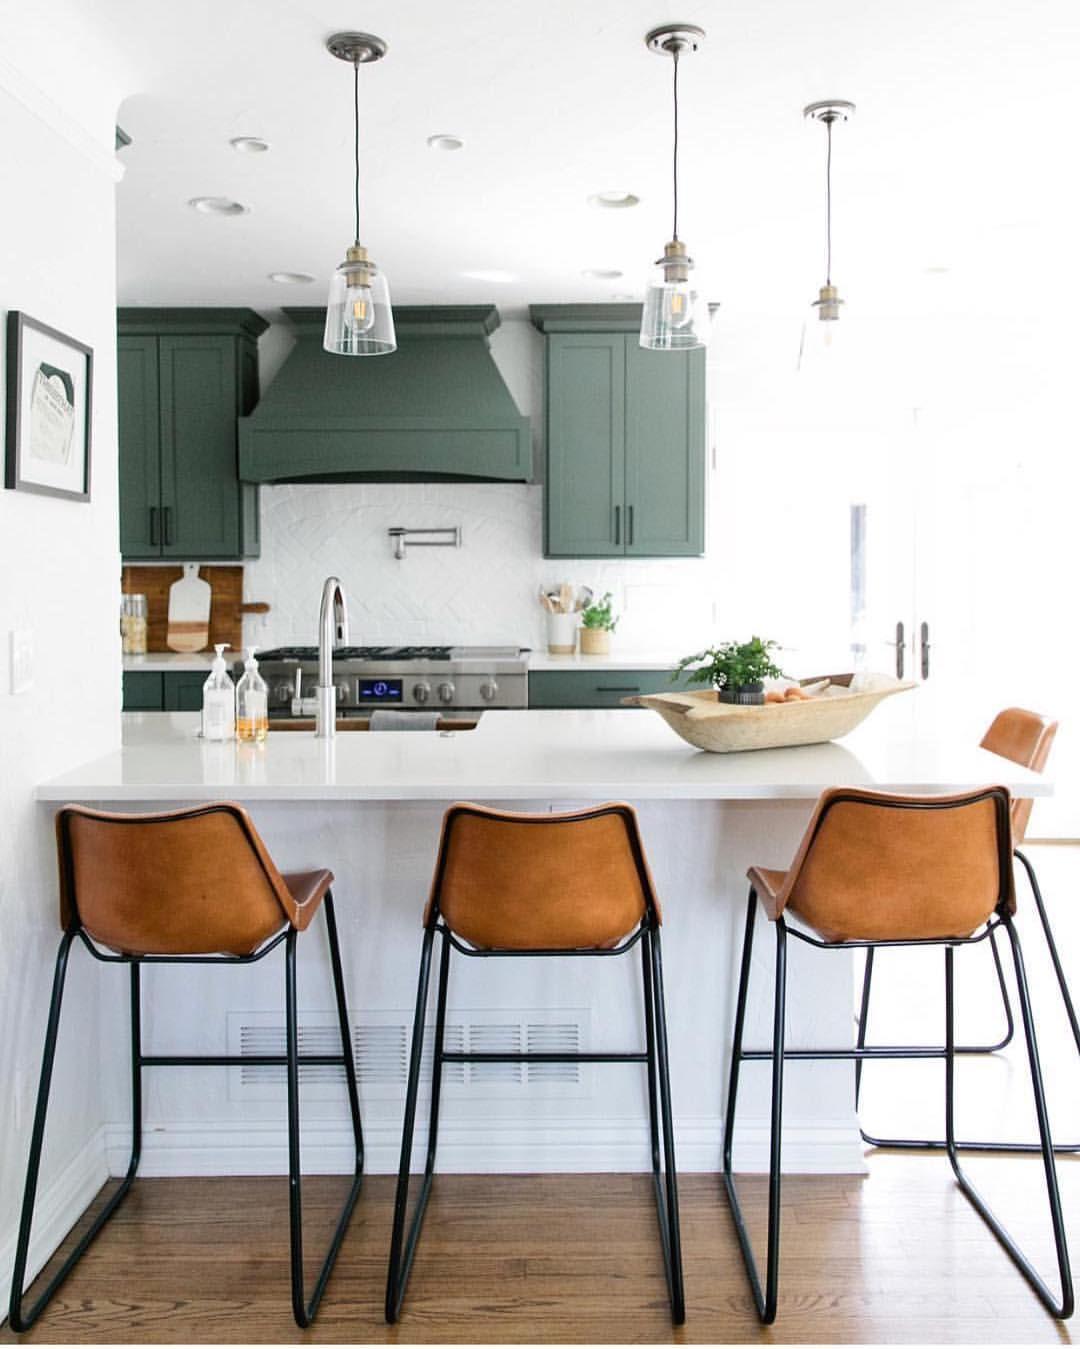 Audrey Crisp On Instagram: U201cAh. What A Pretty Kitchen Remodel! Great Job  @cookdesignhouse 💚 📷: @calliehobbsphotographyu201d